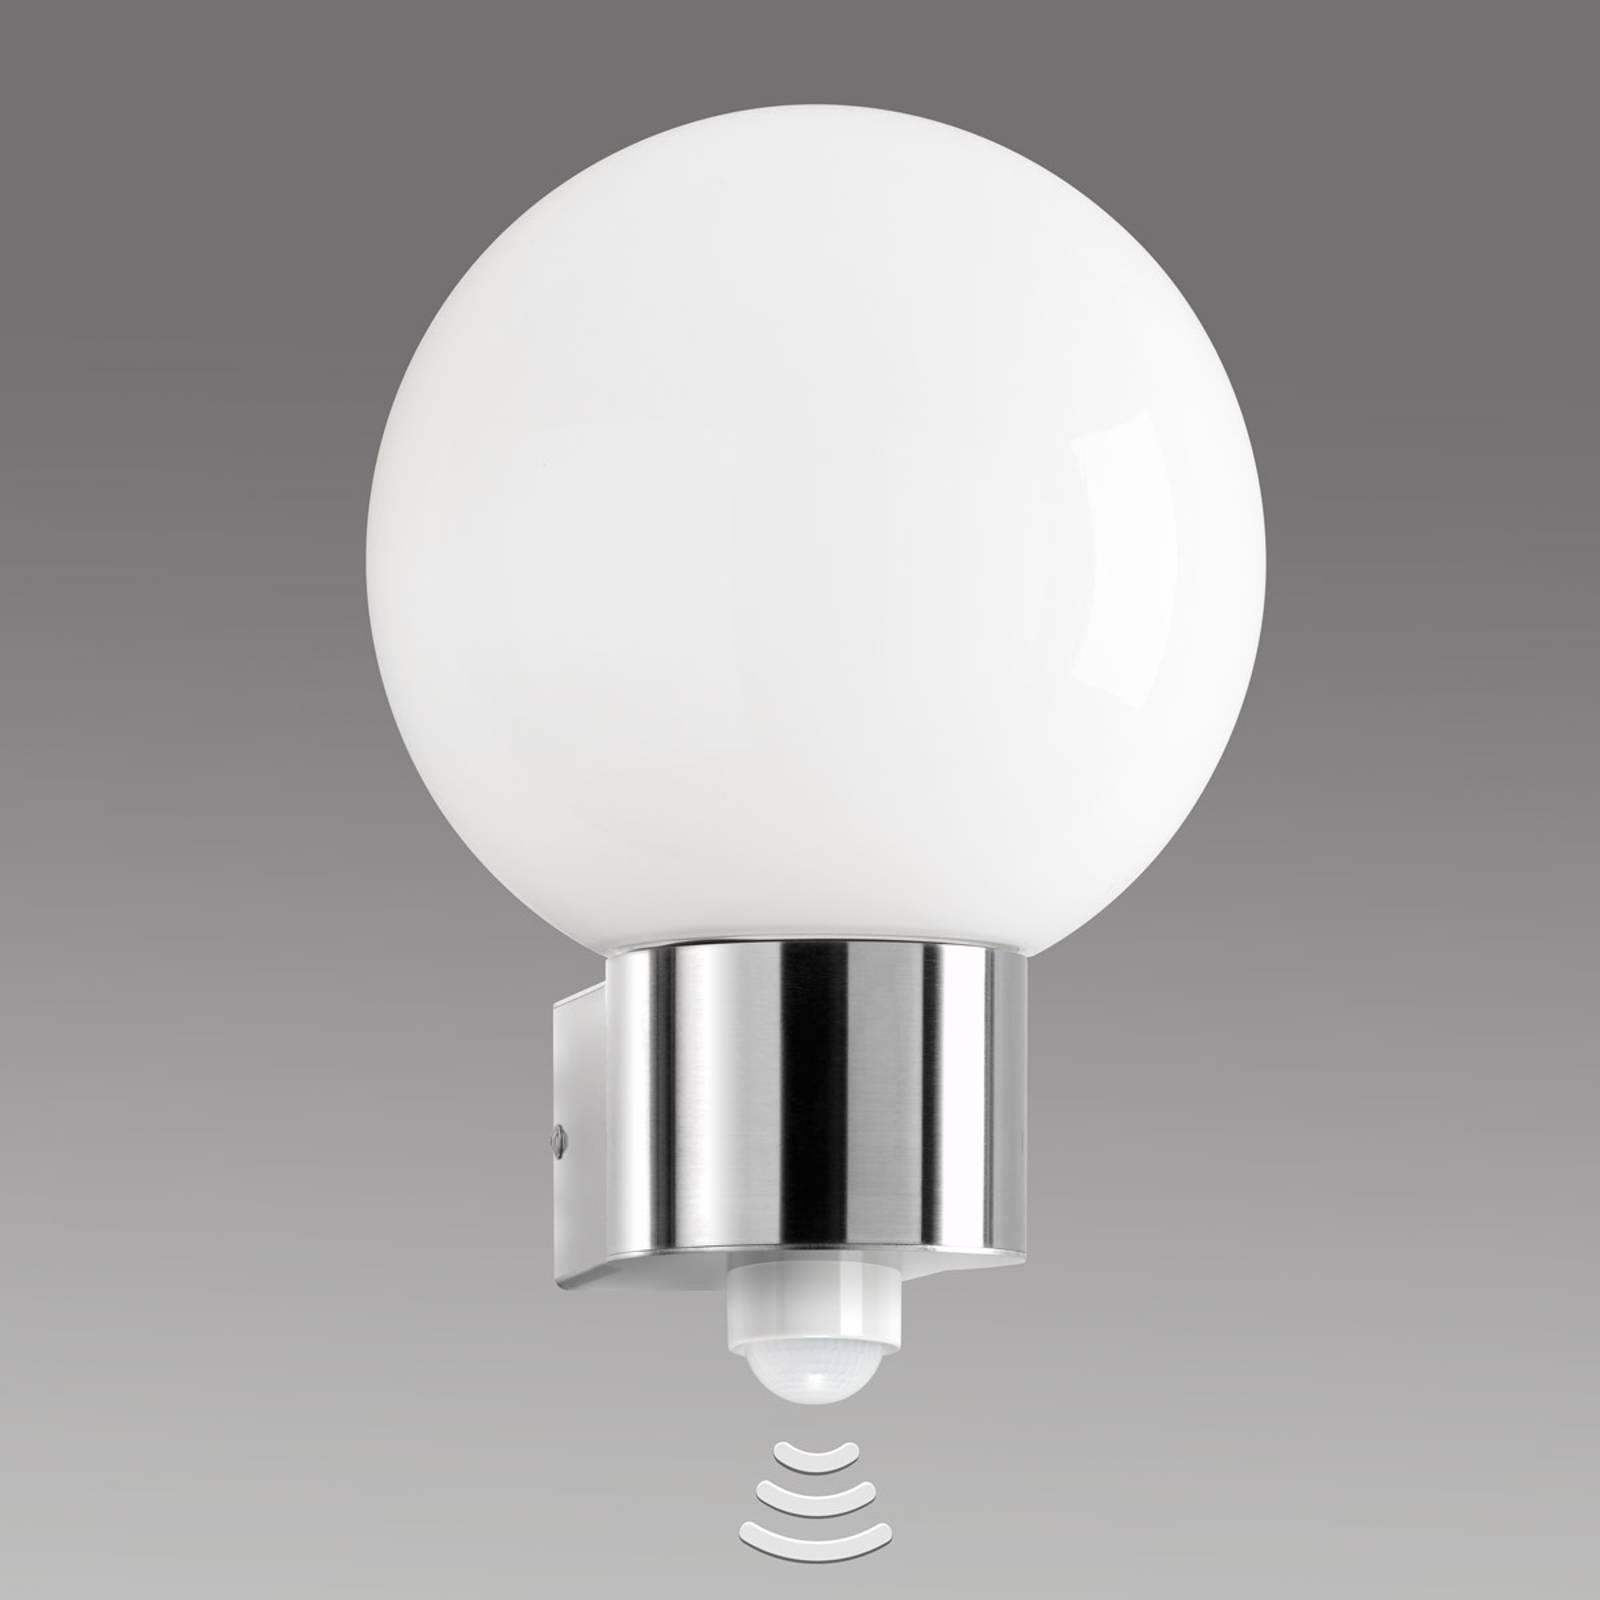 Rvs buitenwandlamp KEKOA, met sensor